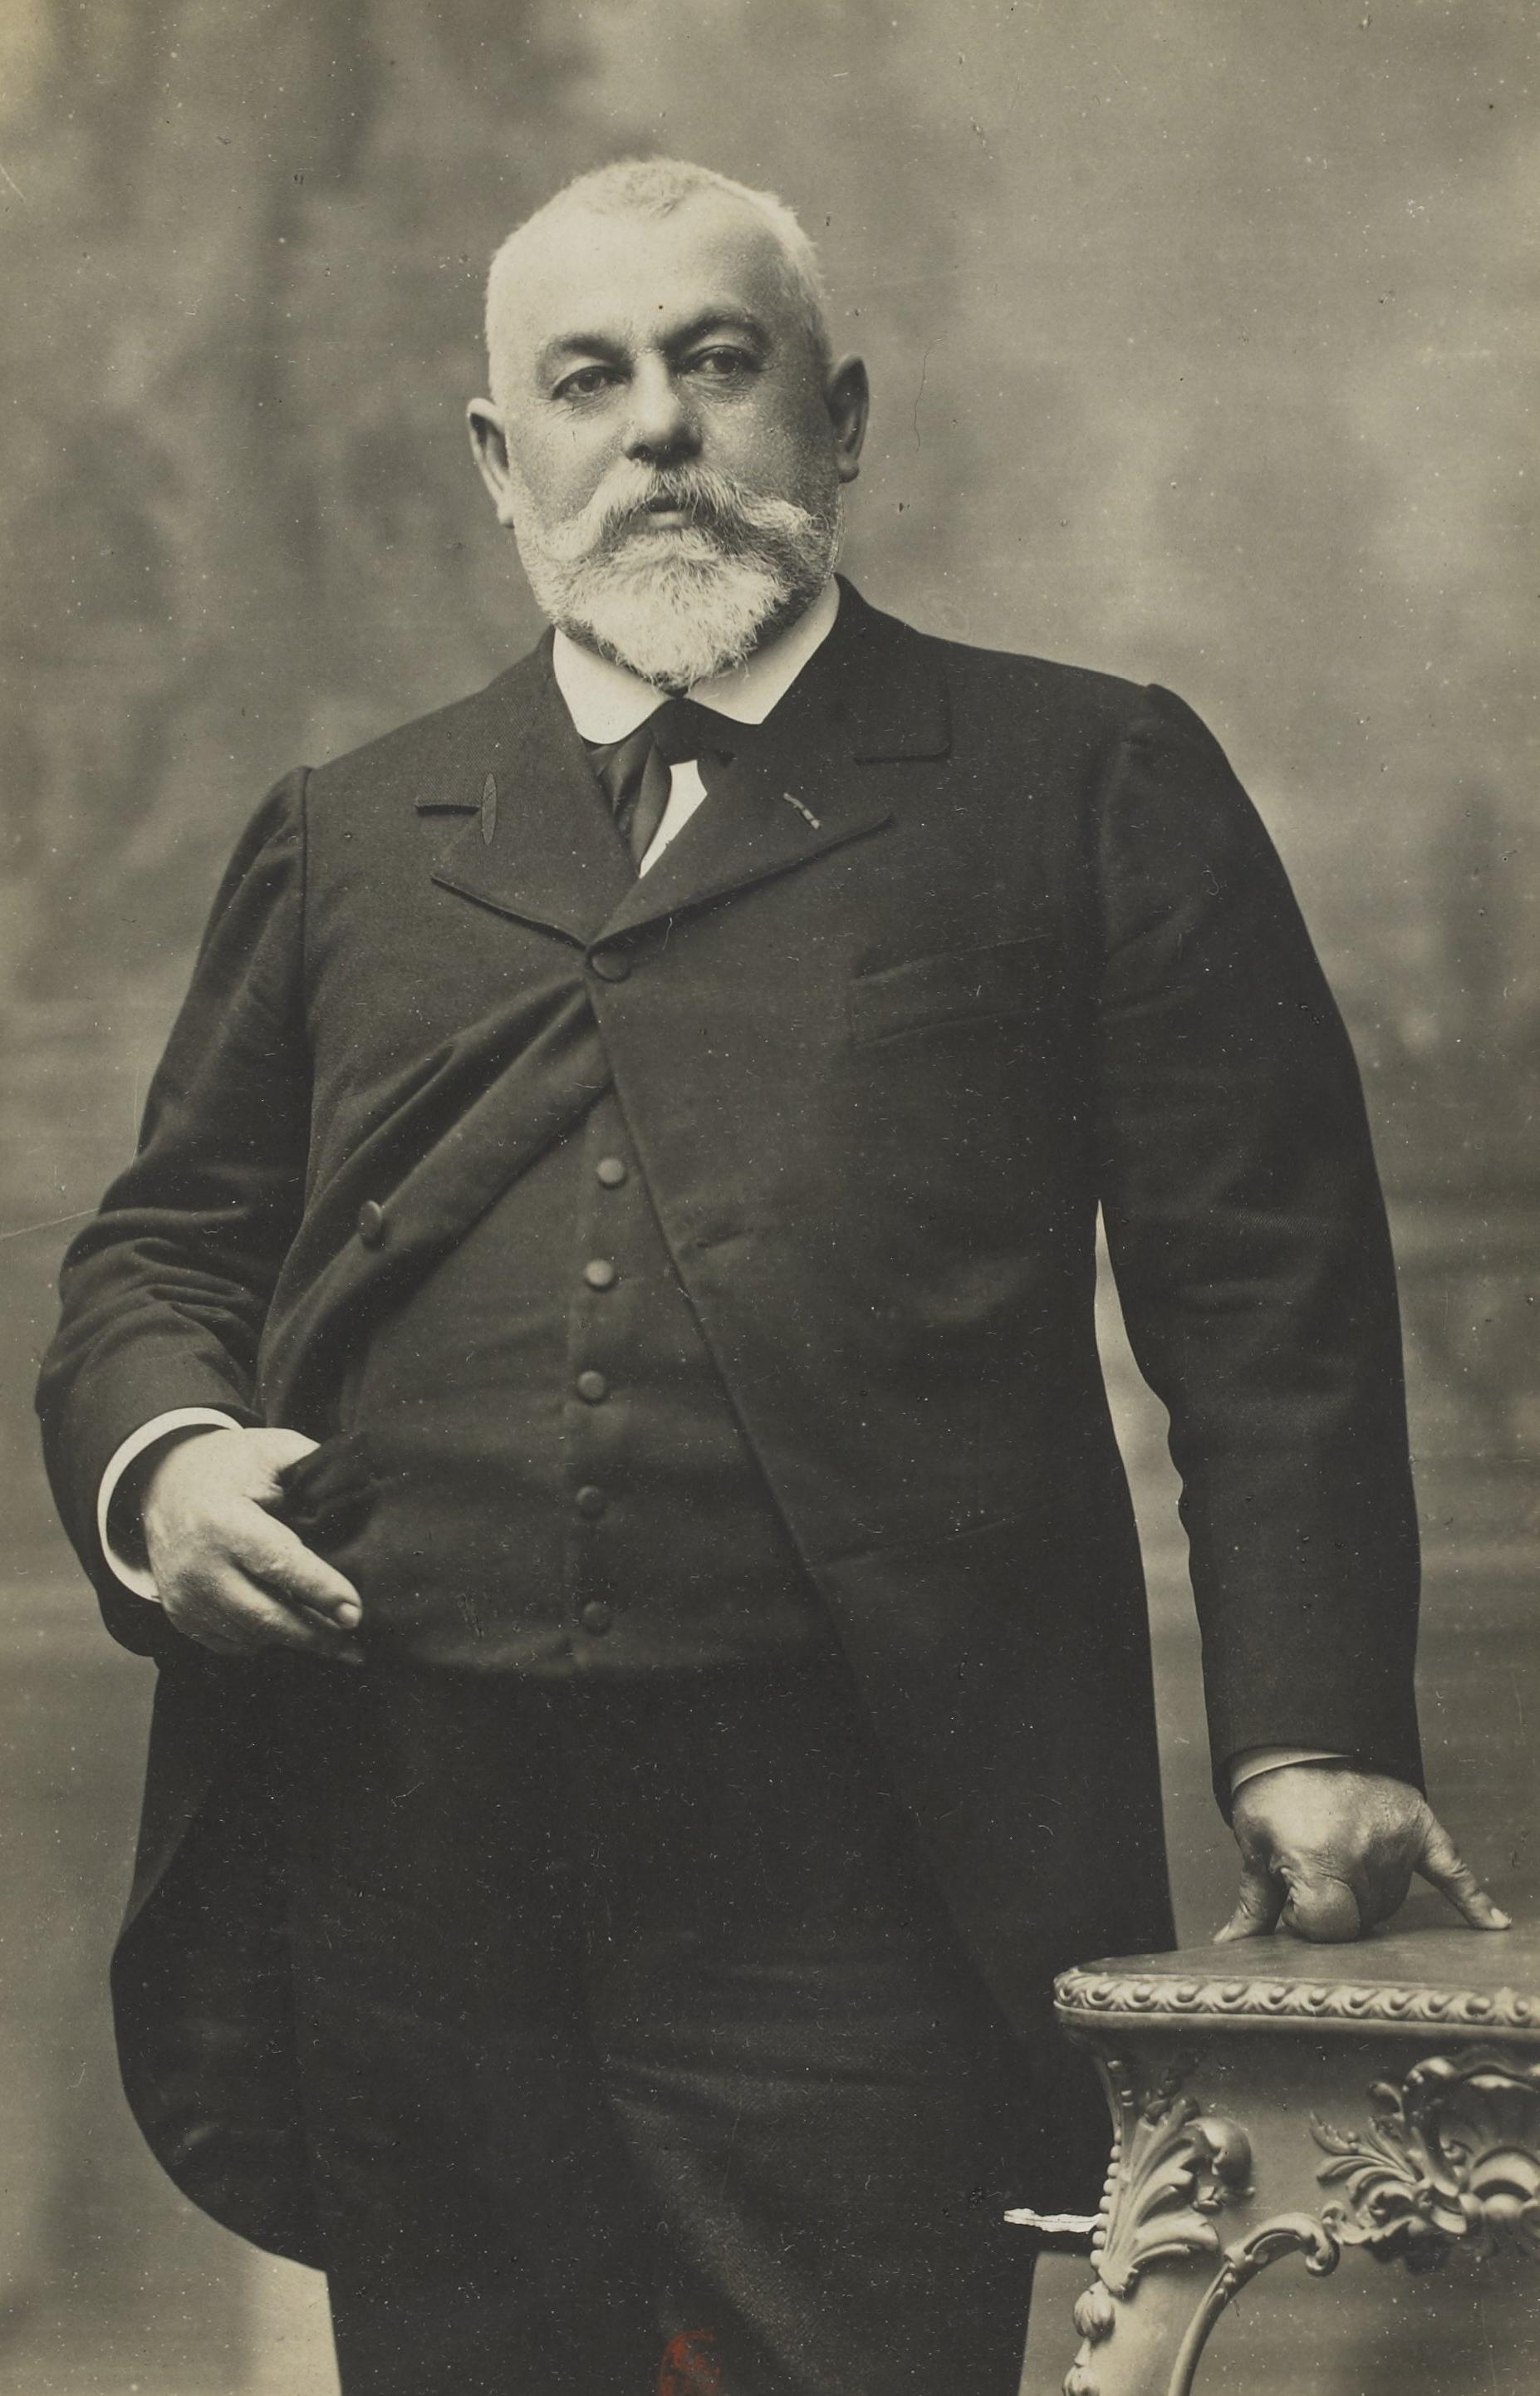 Image of Charles Vapereau from Wikidata